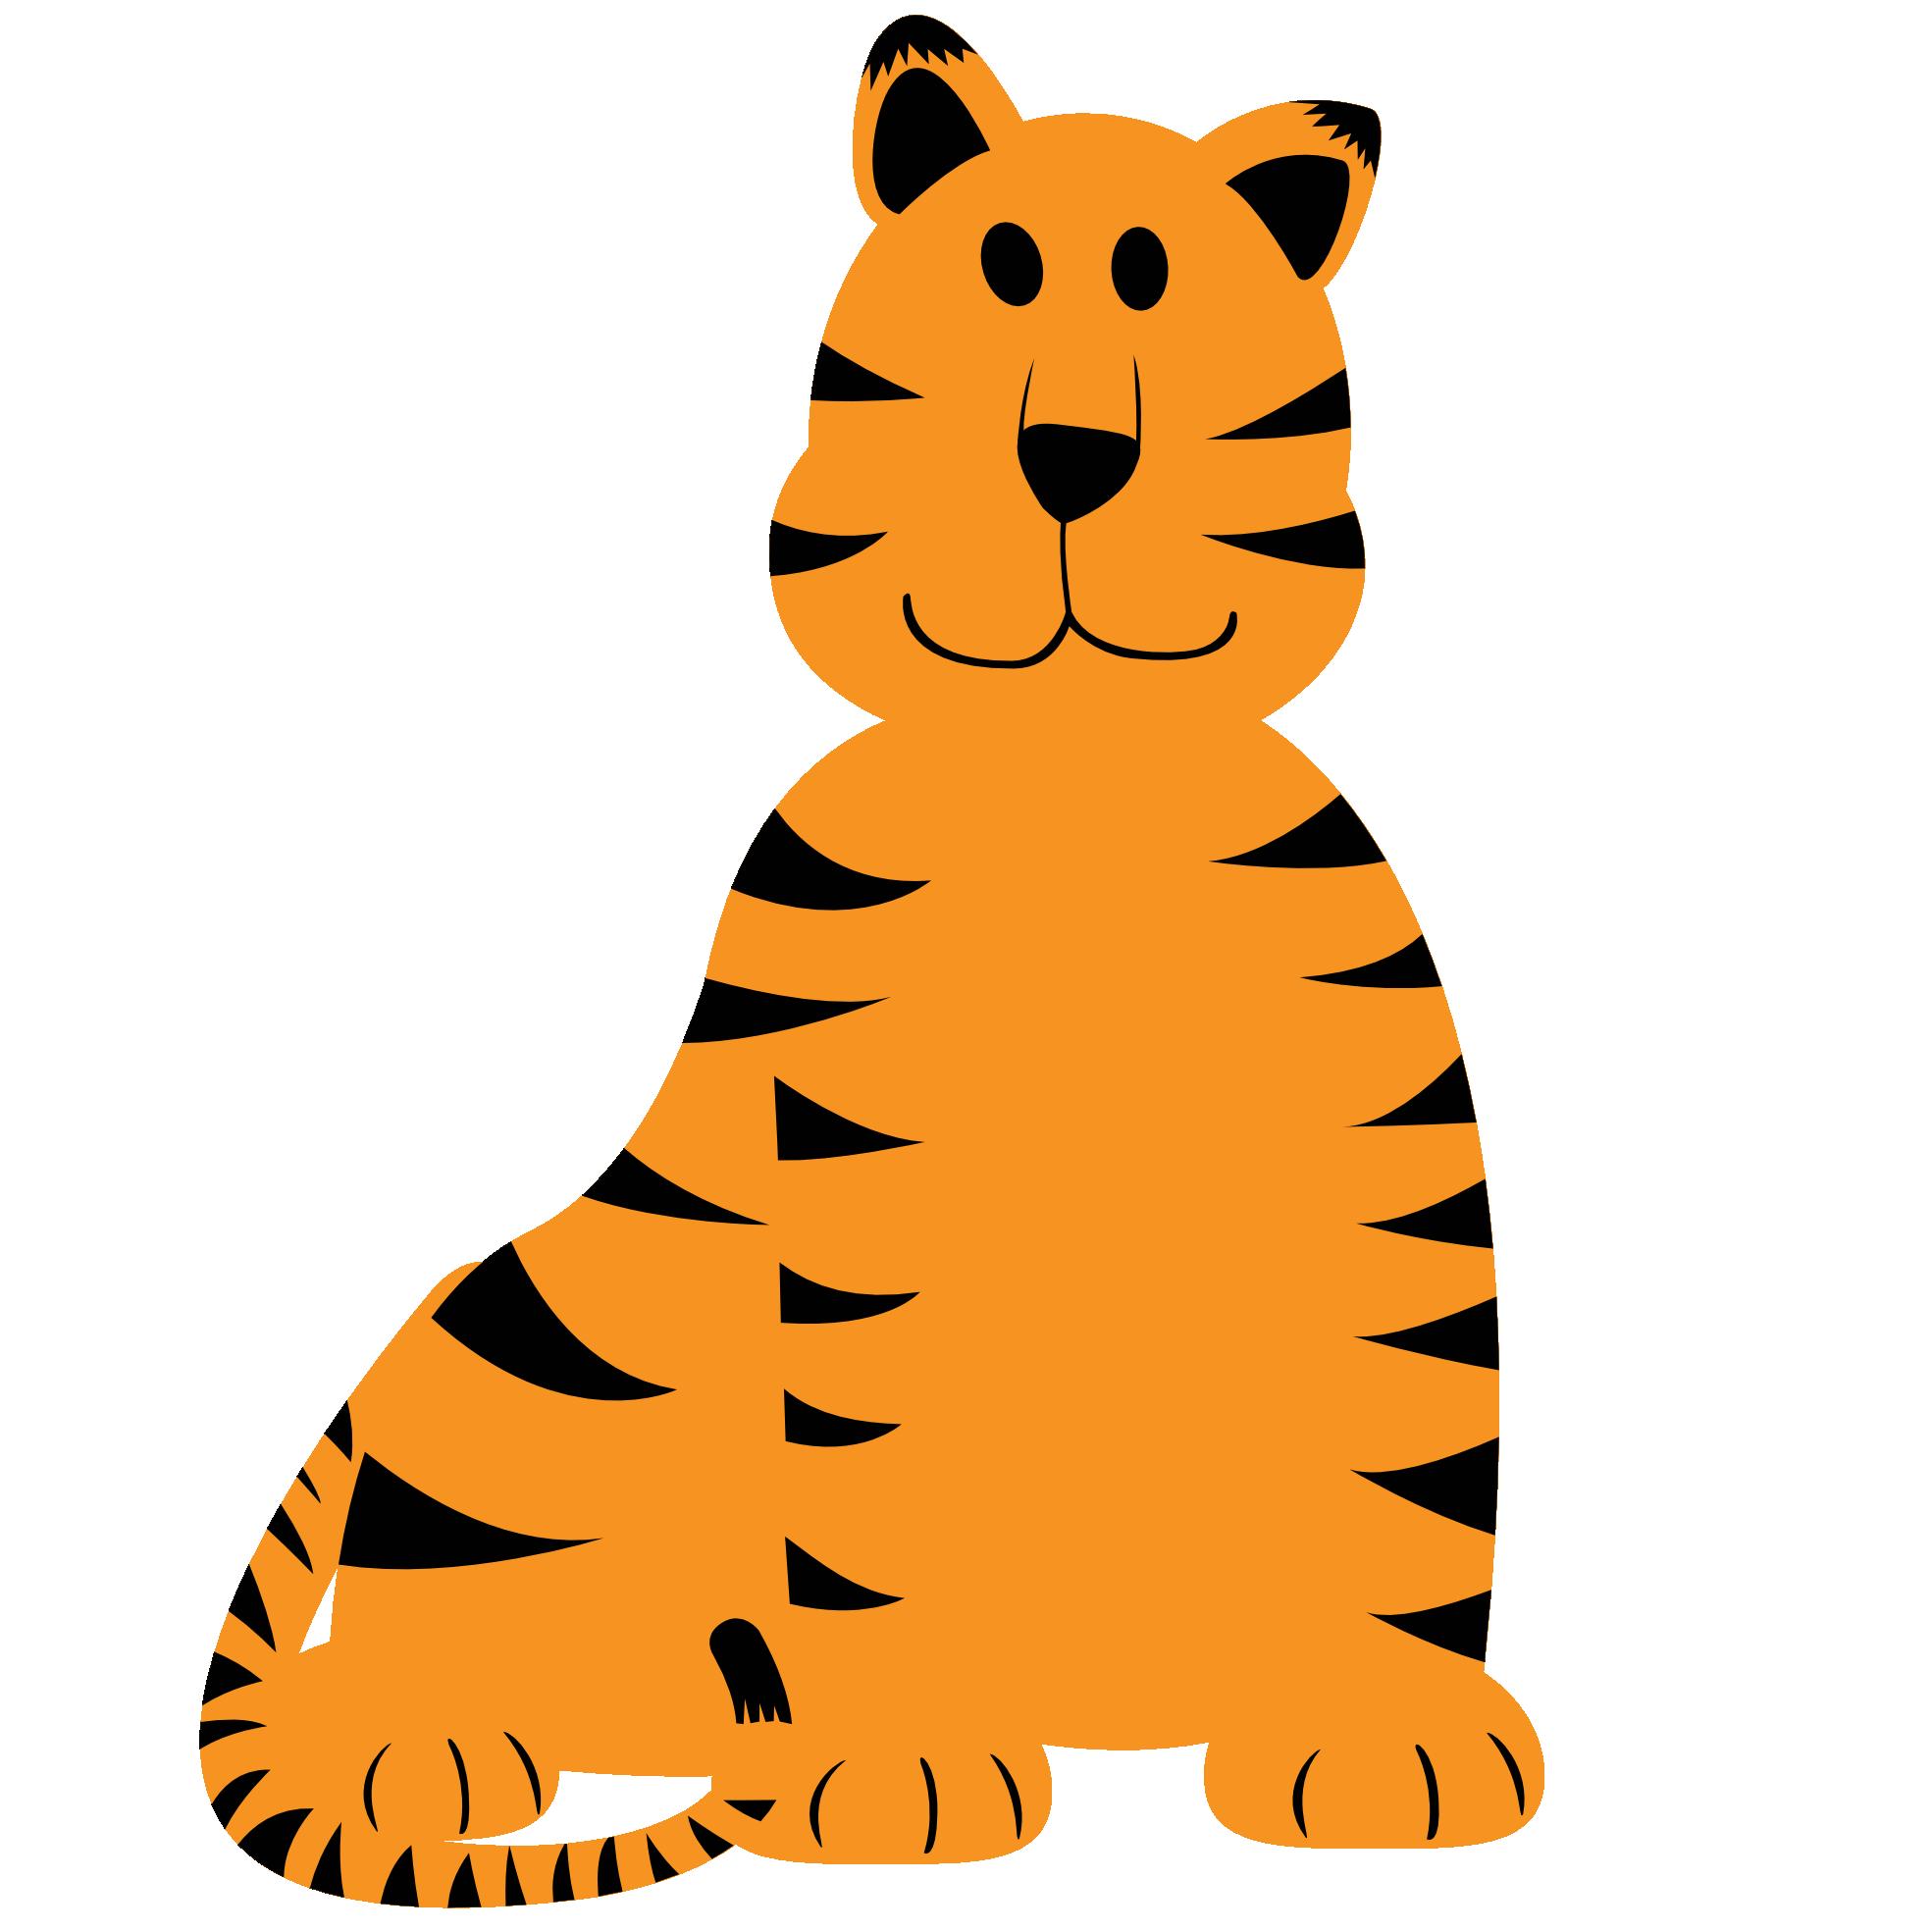 baby tiger face clip art clipart panda free clipart images rh clipartpanda com baby tiger clipart free cute baby tiger clipart free